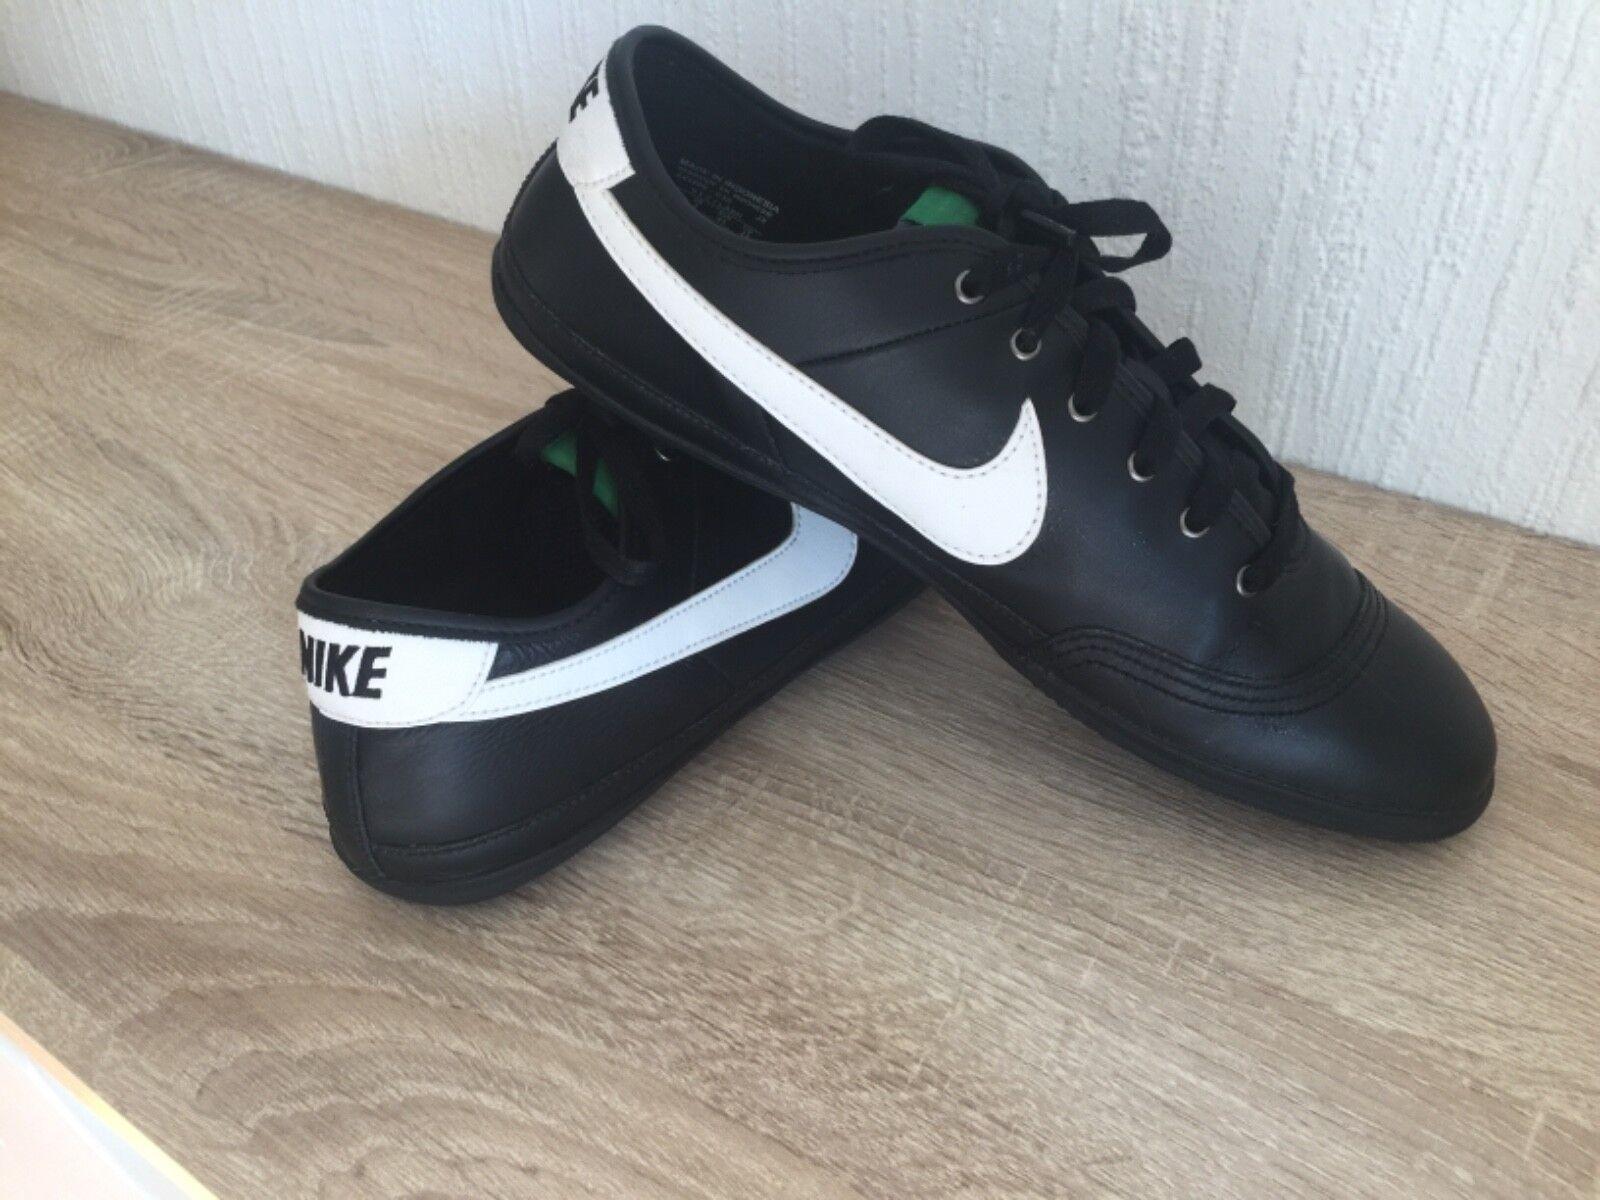 Nike Classic Schuhe Turnschuhe sneaker Herren Größe 44